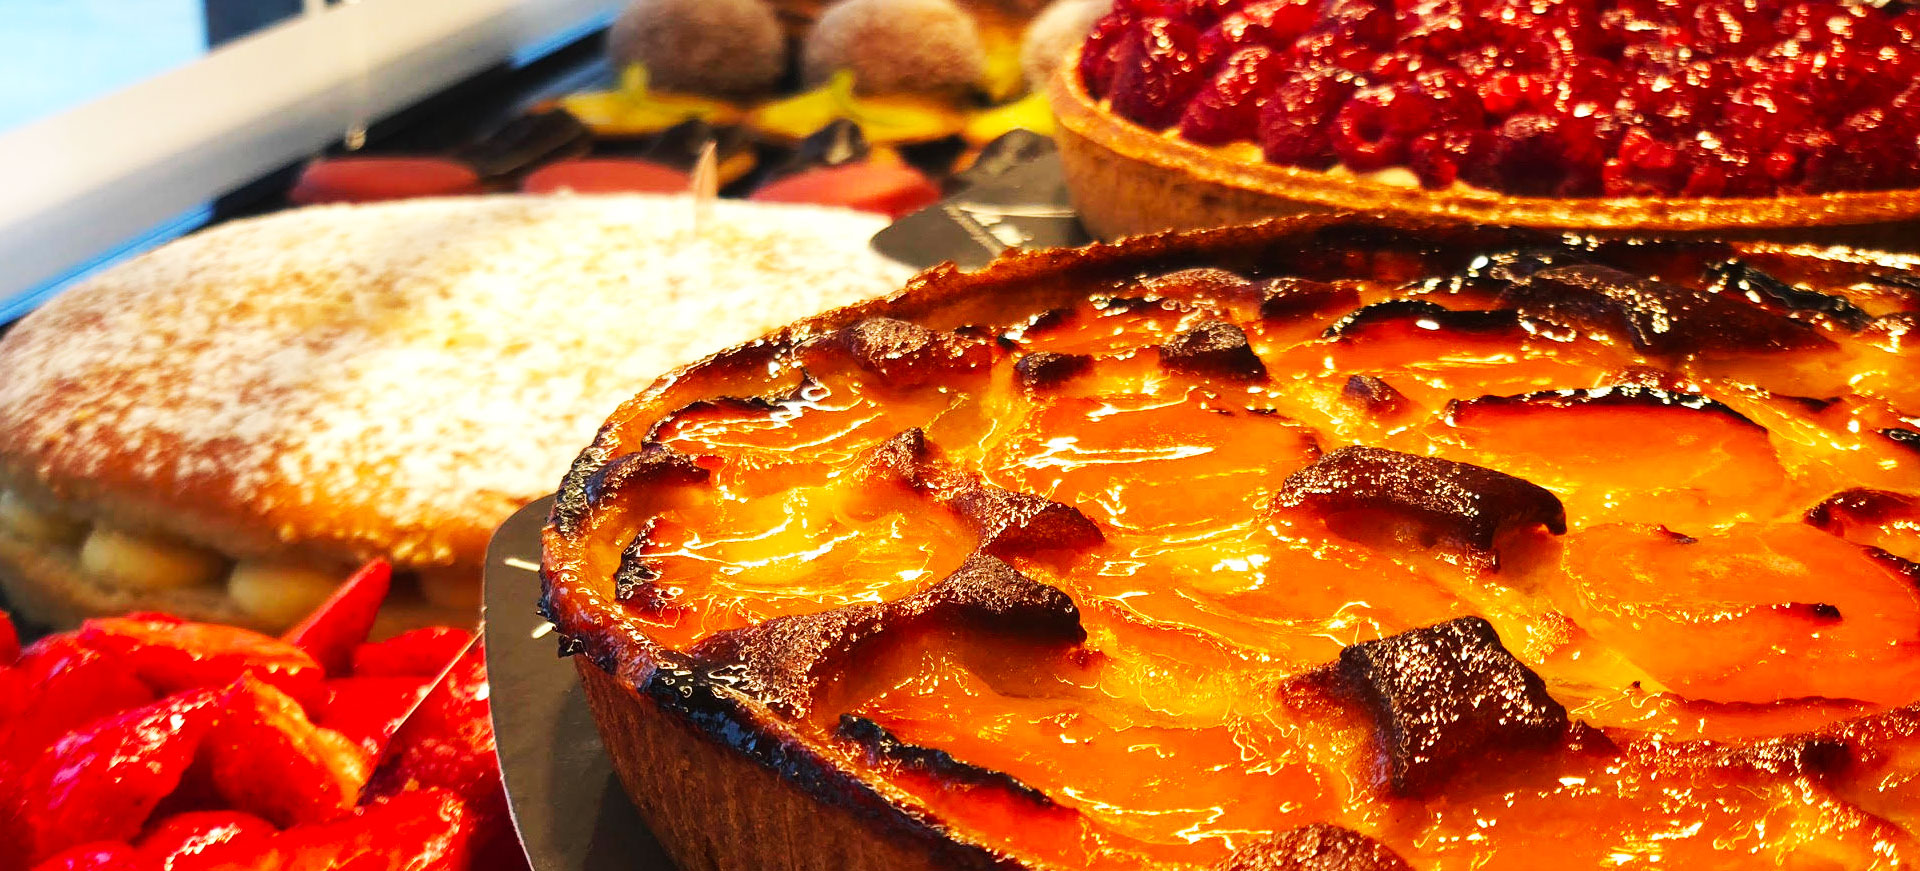 lamiedepain-tarte-abricot-fraise-framboise-lamiedepain--1920x871px